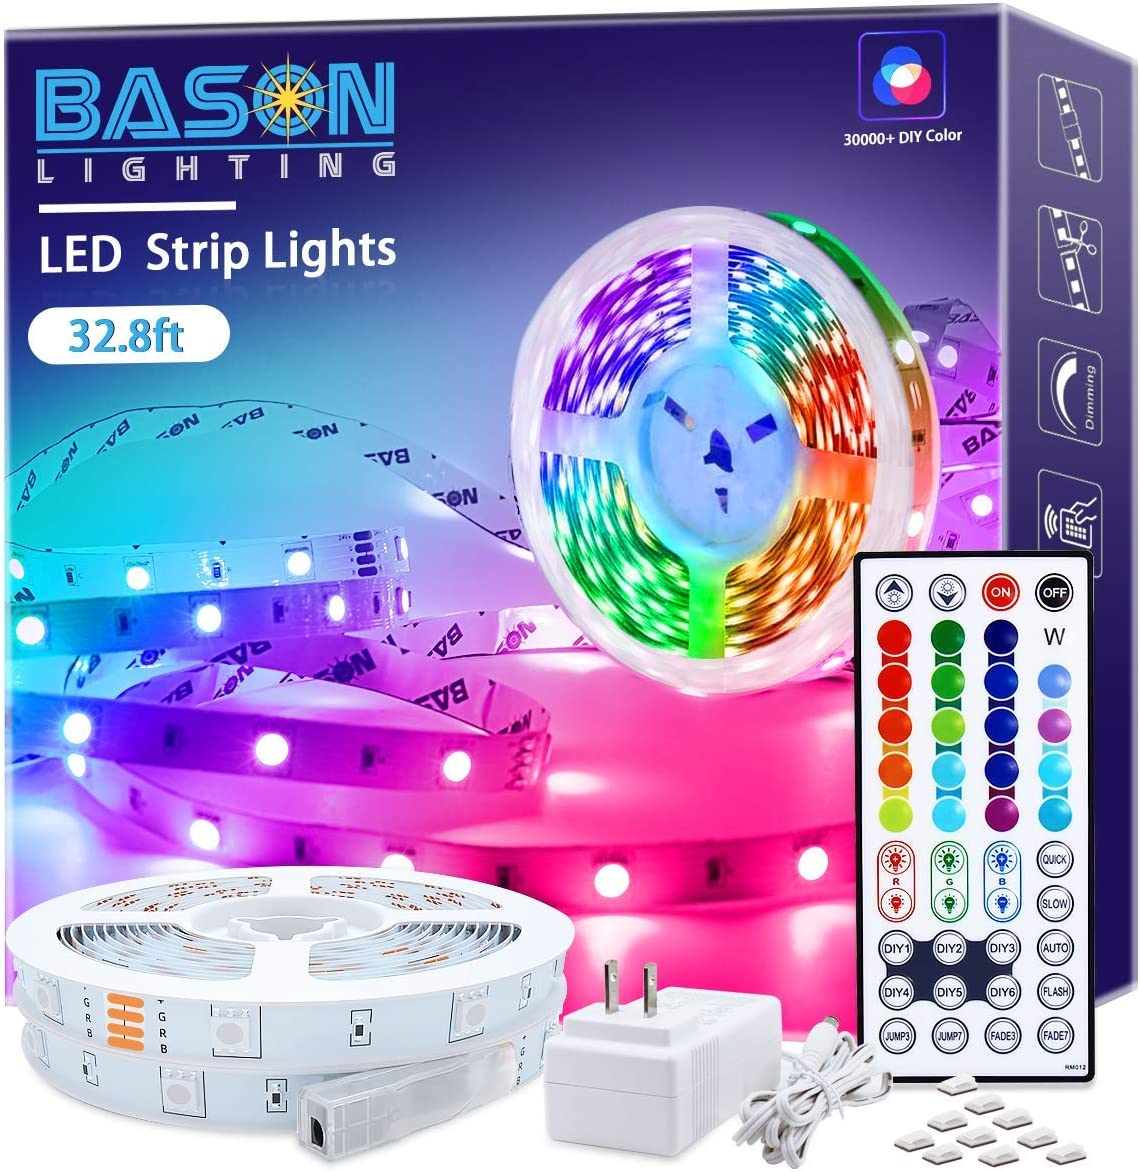 Led Strip Lights 32.8ft, Bason Led Lights for Bedroom with 44 Keys Remote and Power Supply, High Bright 300 LEDs Color Changing Light Strips Kit for Kitchen,Bar,Indoor,Party DIY Decoration.